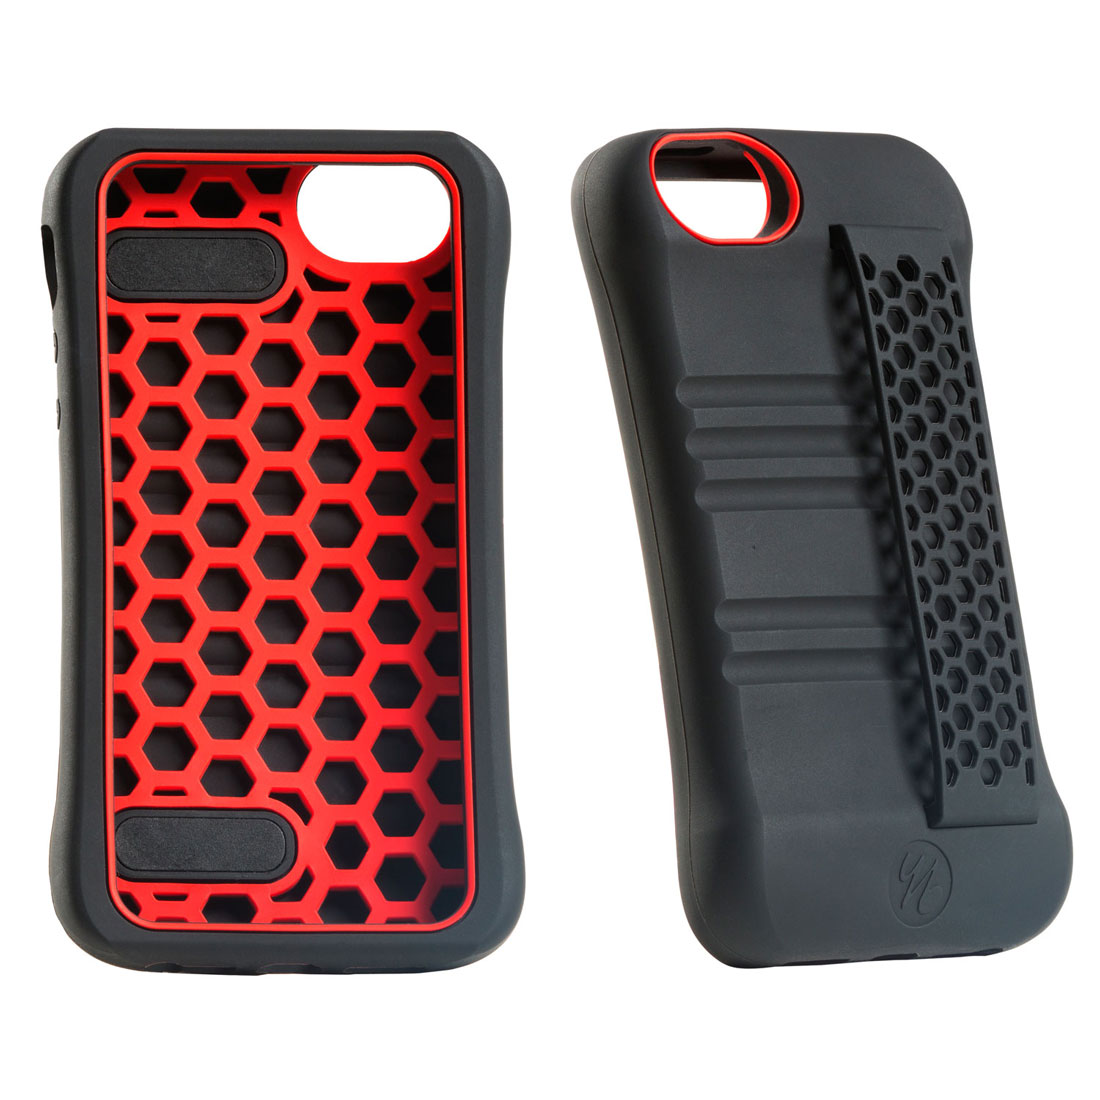 Etui de protection running yurbuds Race Case pour iPhone 5/5S.